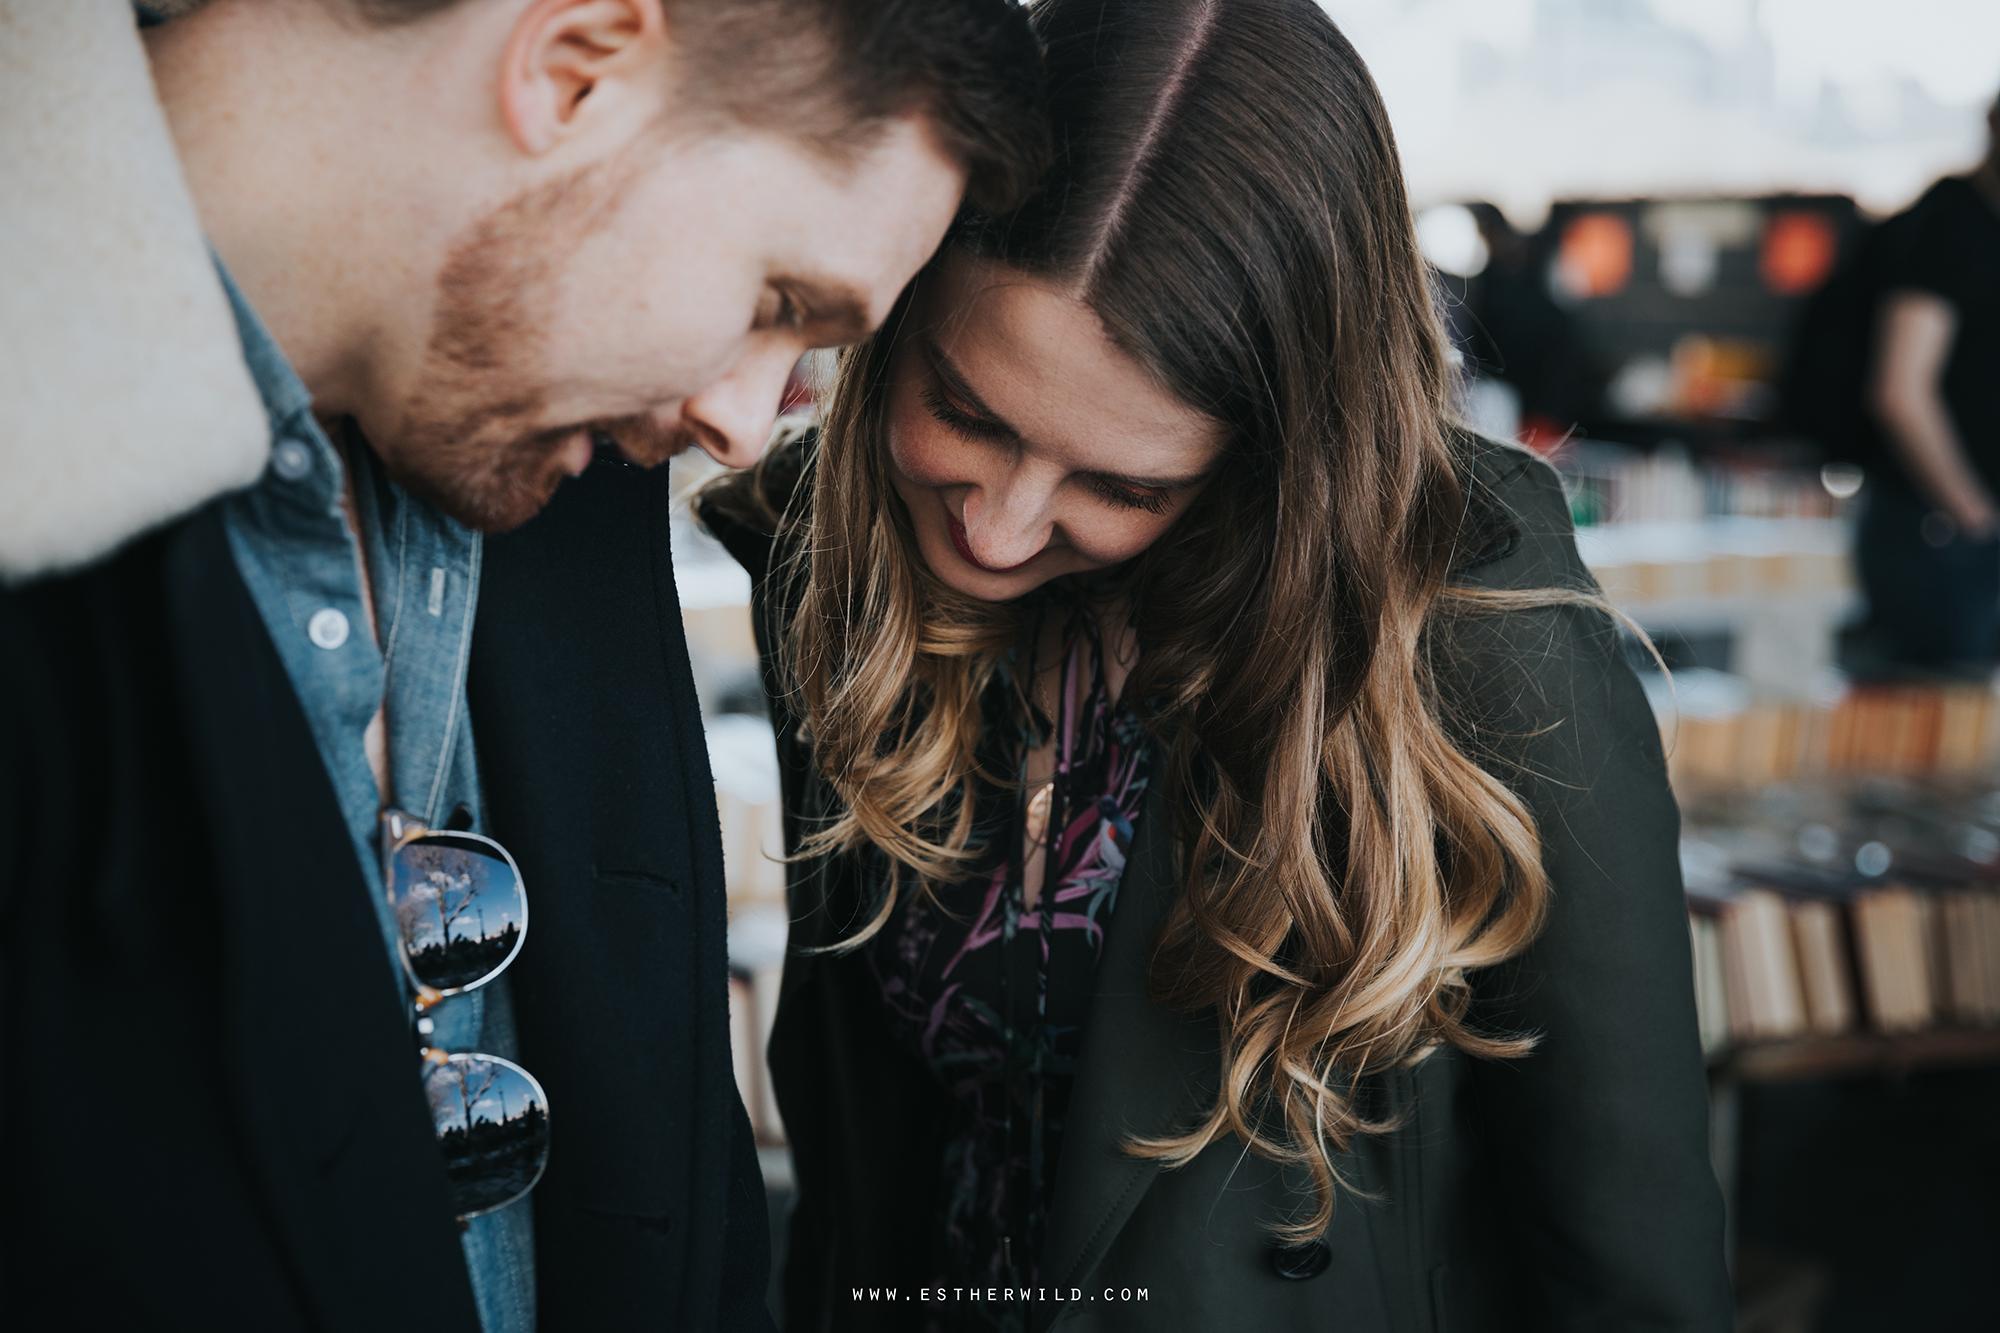 London_Engagement_Session_Pre-Wedding_Photo_Shoot_Esther_Wild_Photographer_IMG_0871.jpg